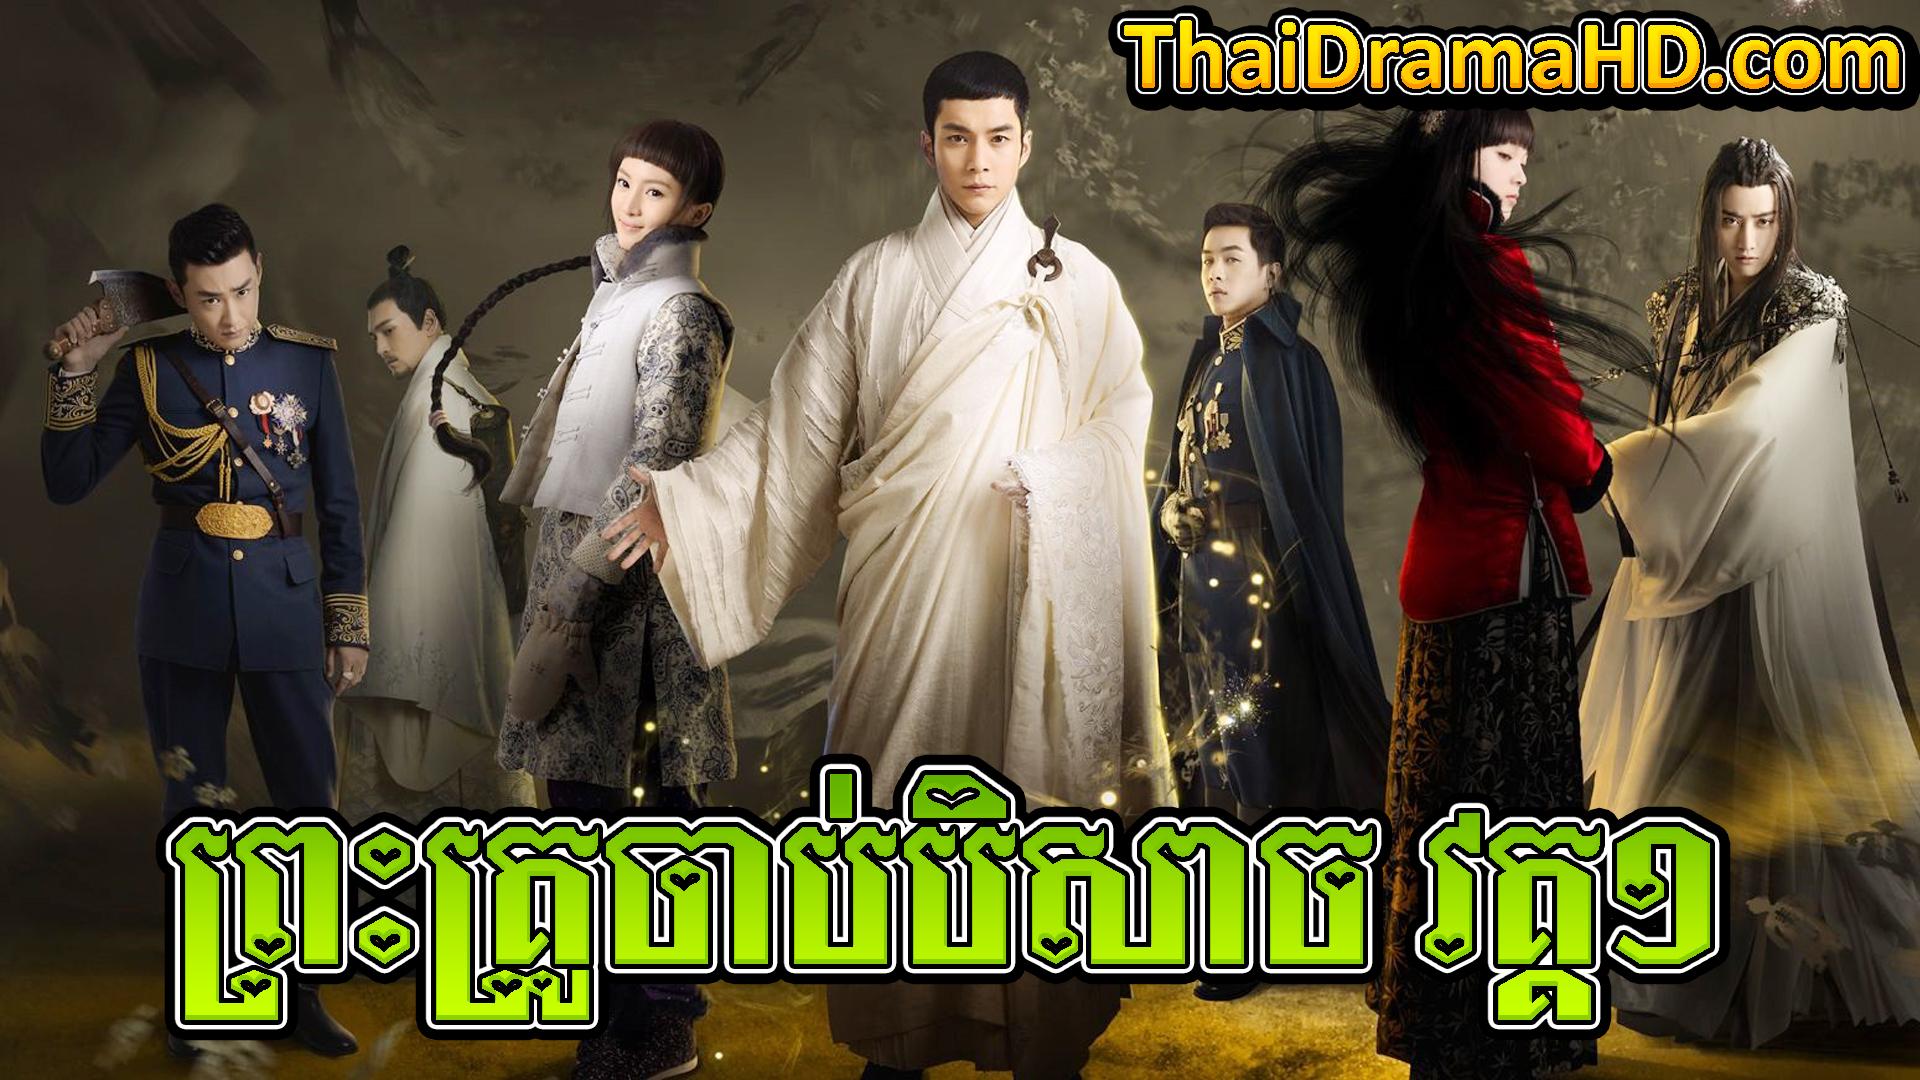 Preah Krou Chab Beisach | Thai Drama | Khmer Movie | Phumikhmer | movie-khmer | video4khmer | khmotions | kolabkhmer | khmer drama | ksdrama | cookingtips | roscheat | khmertimeskh | khmerkomsan | phumi7 | merlkon | film2us | movie2kh | sweetdrama | khmercitylove | khreplay | tvb cambodia drama | ckh7 | srokthai | phumimedia | phumi8 | khmer avenue | khmer search | Soyo | khmerfans